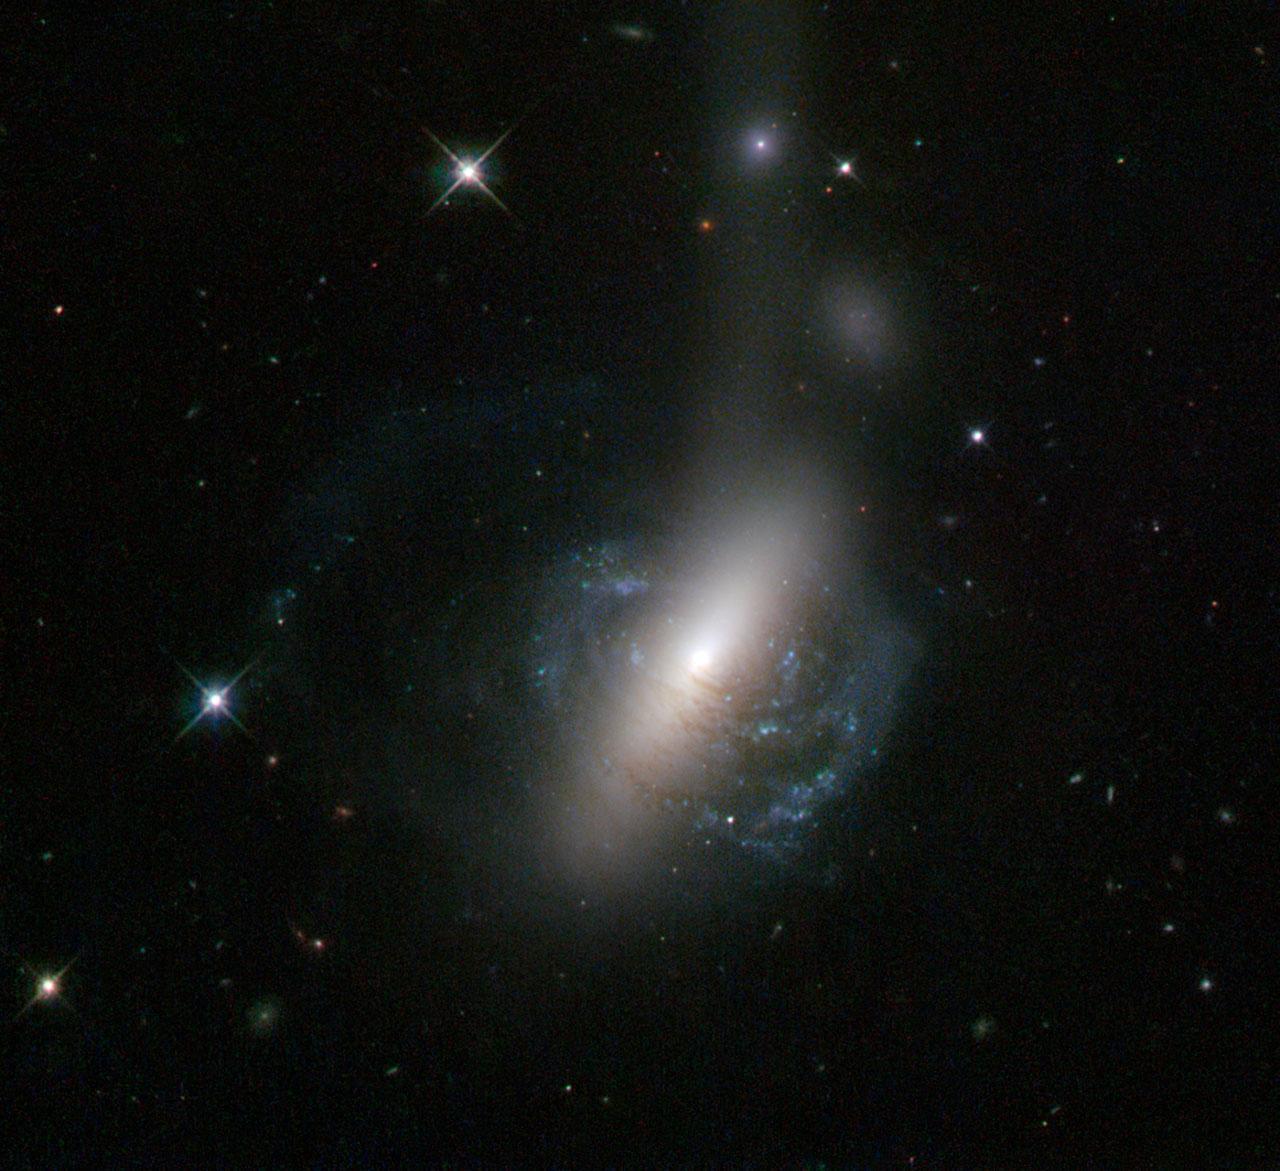 hubble telescope galaxies colliding - photo #23